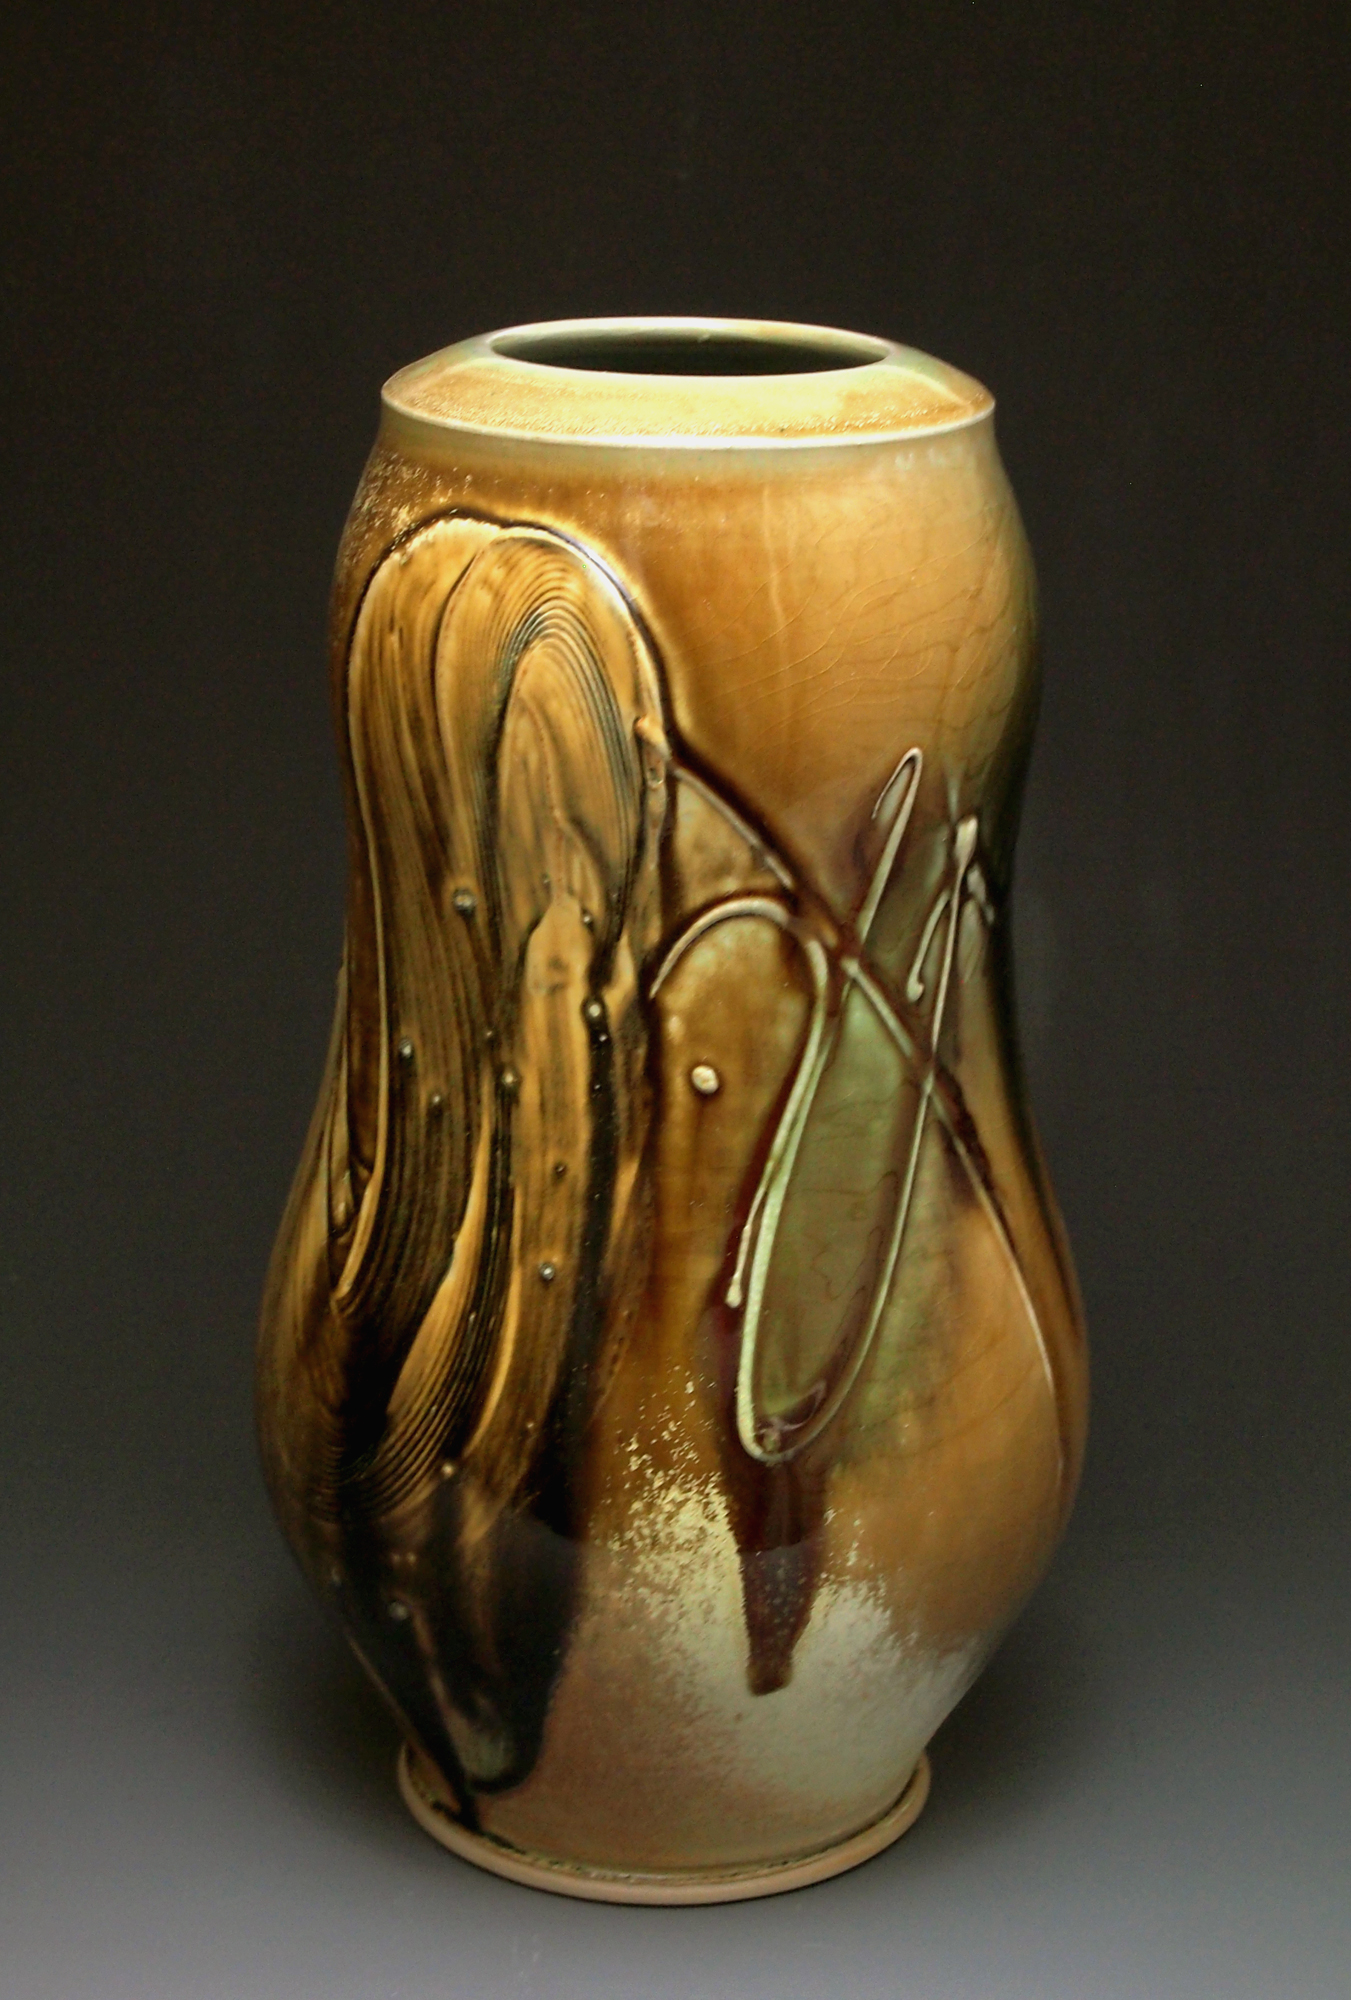 Double-Tall-Vase-2.jpg